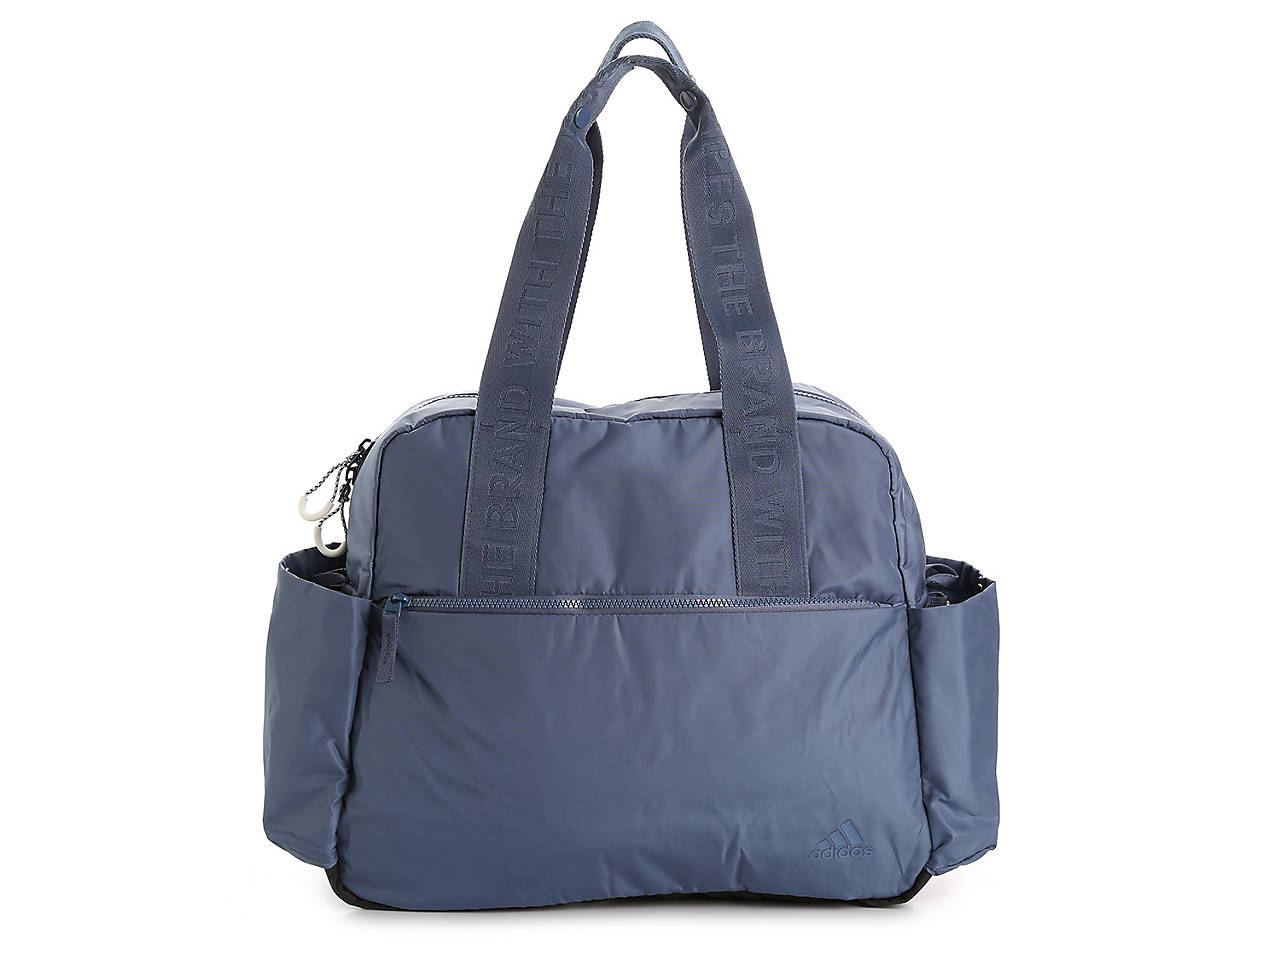 c6c838073 adidas Sport To Street Gym Bag Women's Handbags & Accessories | DSW